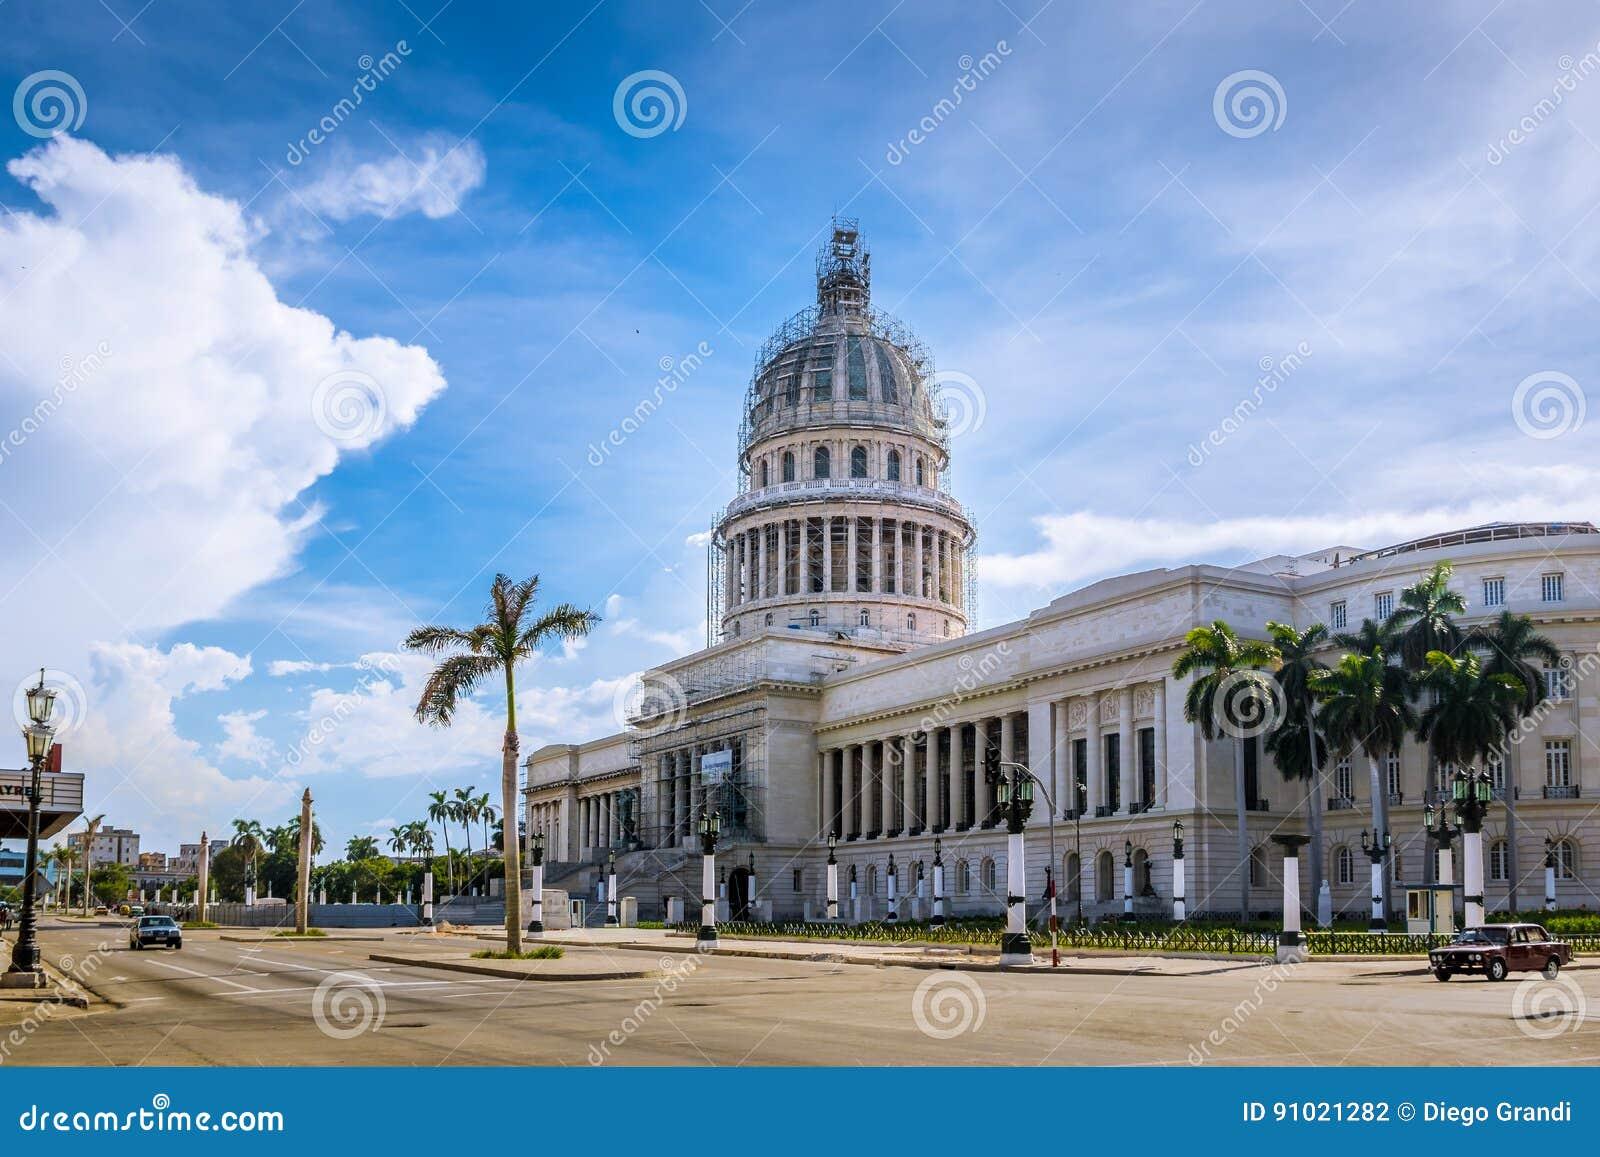 The Capitol El Capitolio building - Havana, Cuba